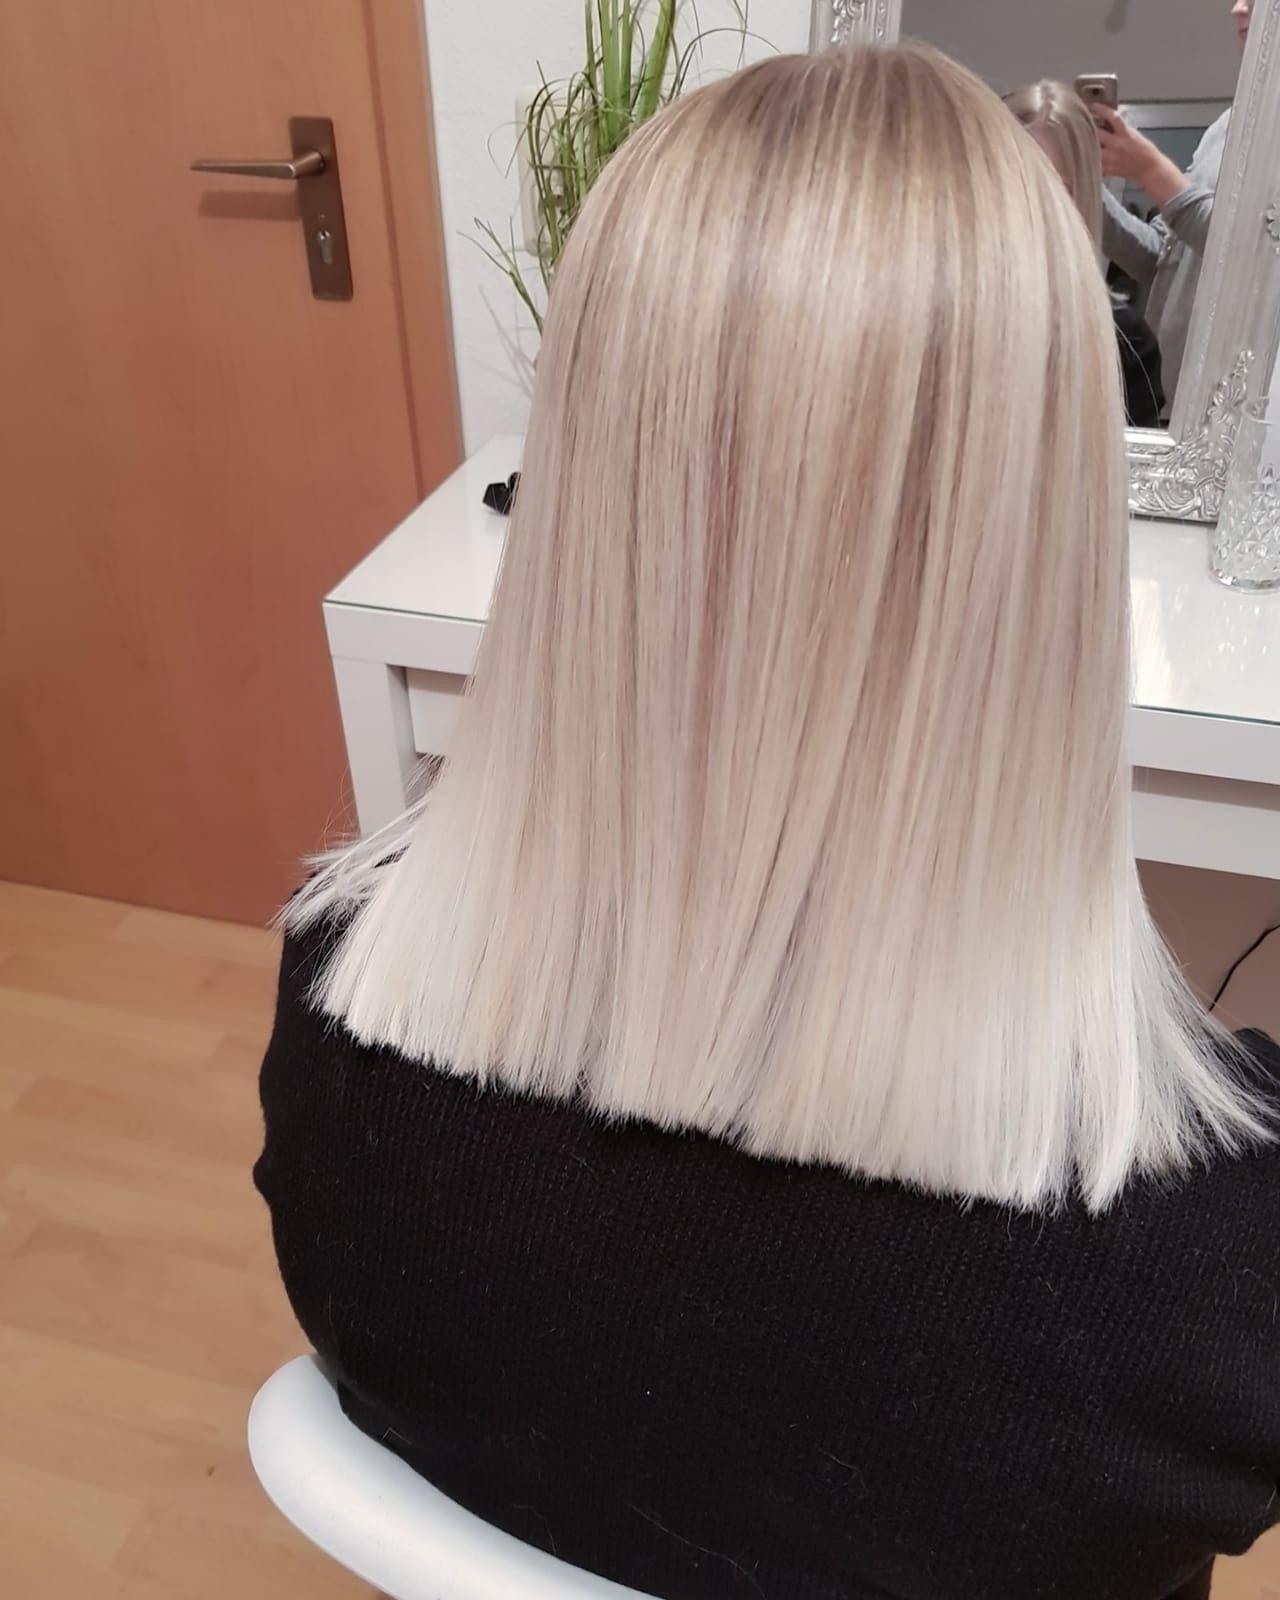 Ice Blond moderner Look mittellanges Haar